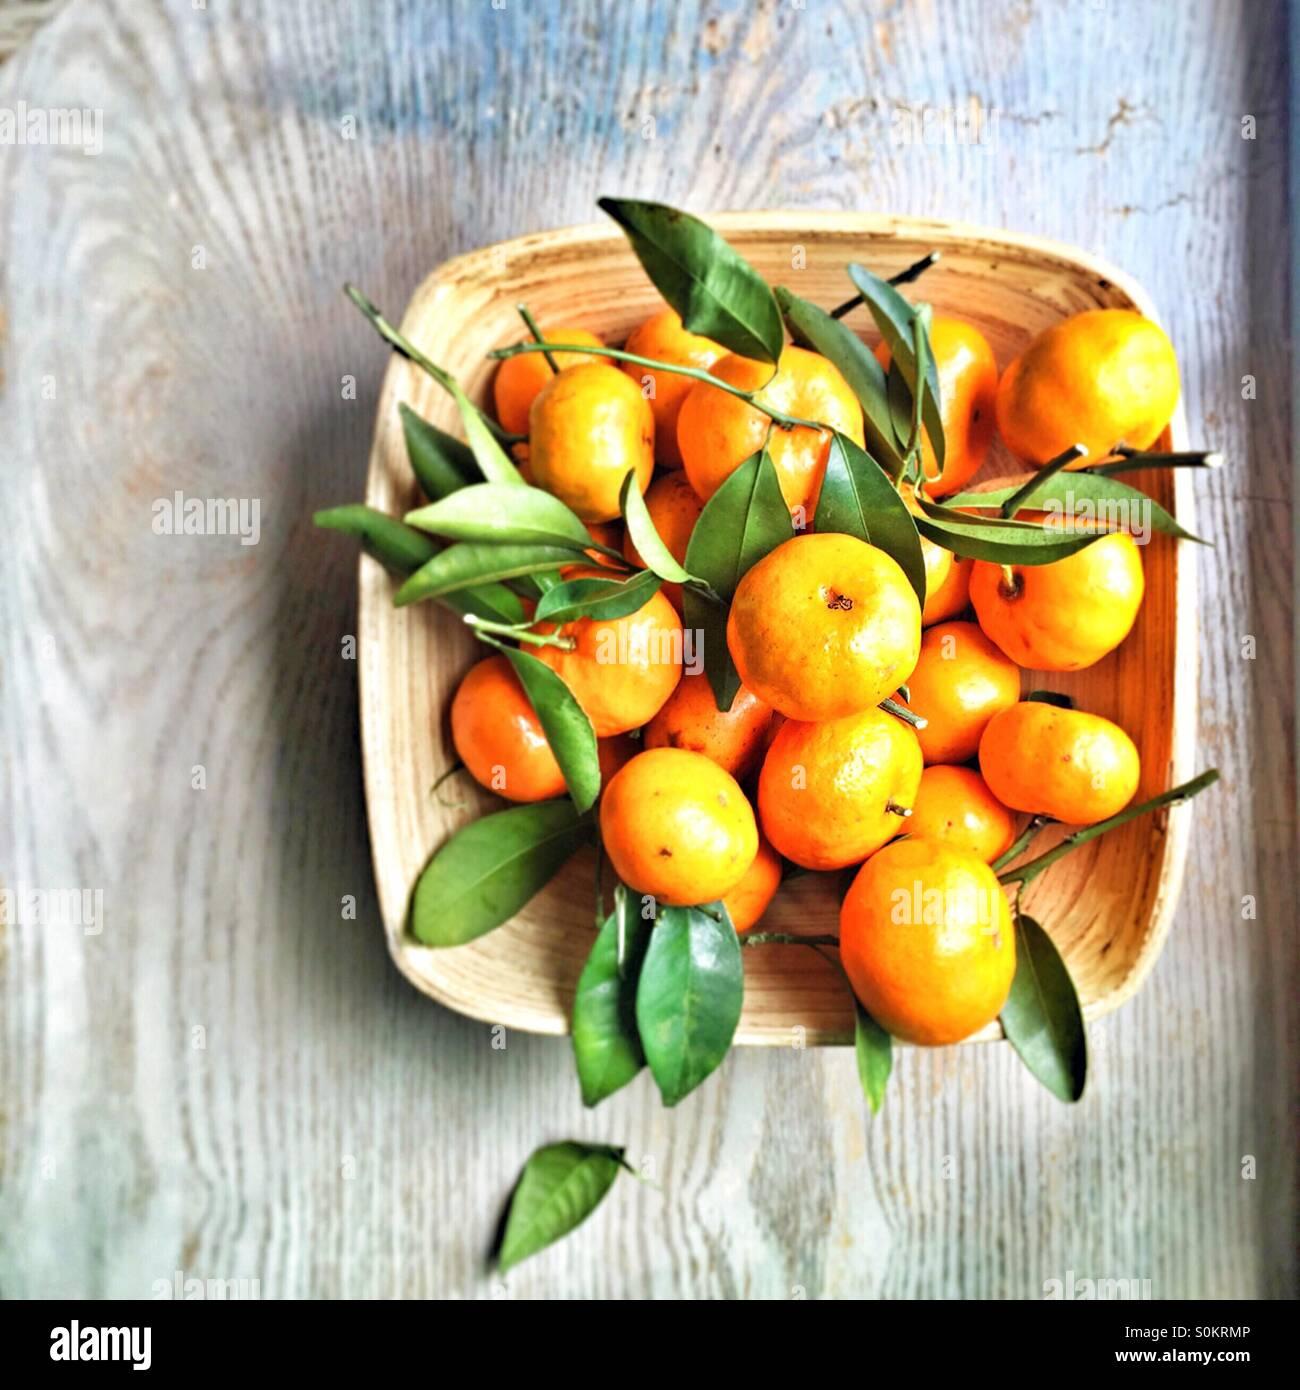 basket of oranges Stock Photo